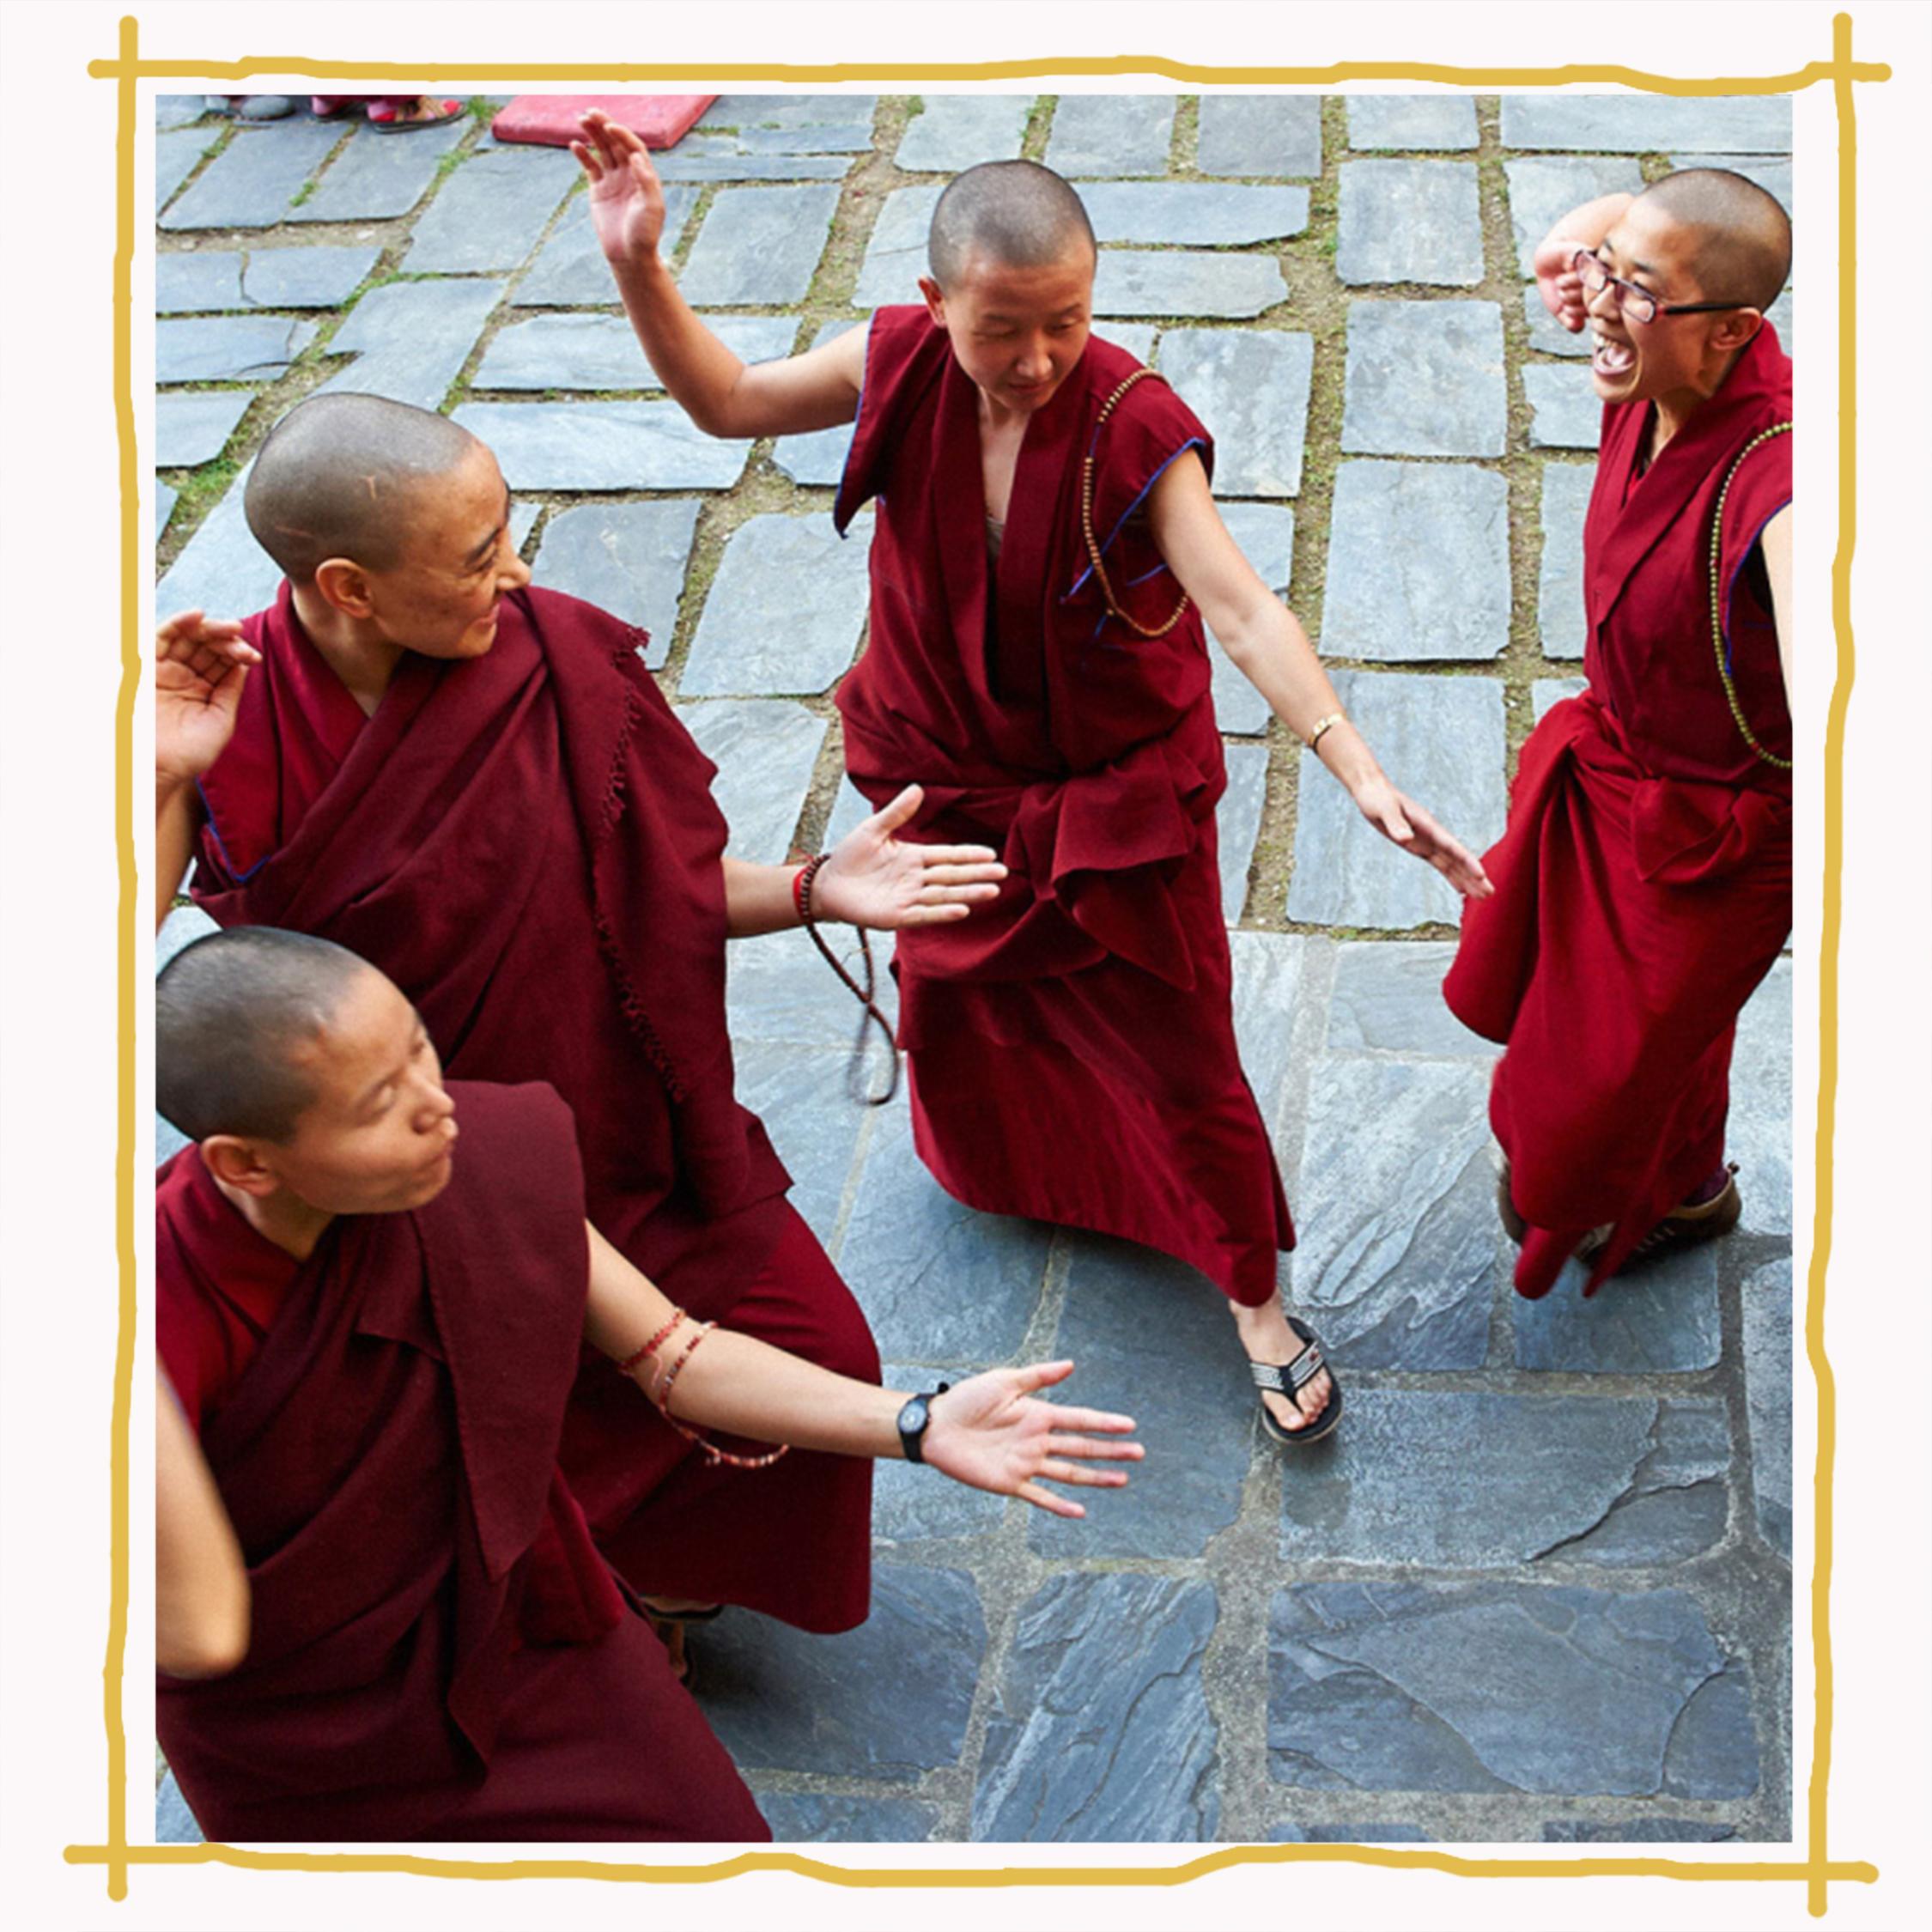 Tibetan nuns in celebration  Image: Olivier Adam